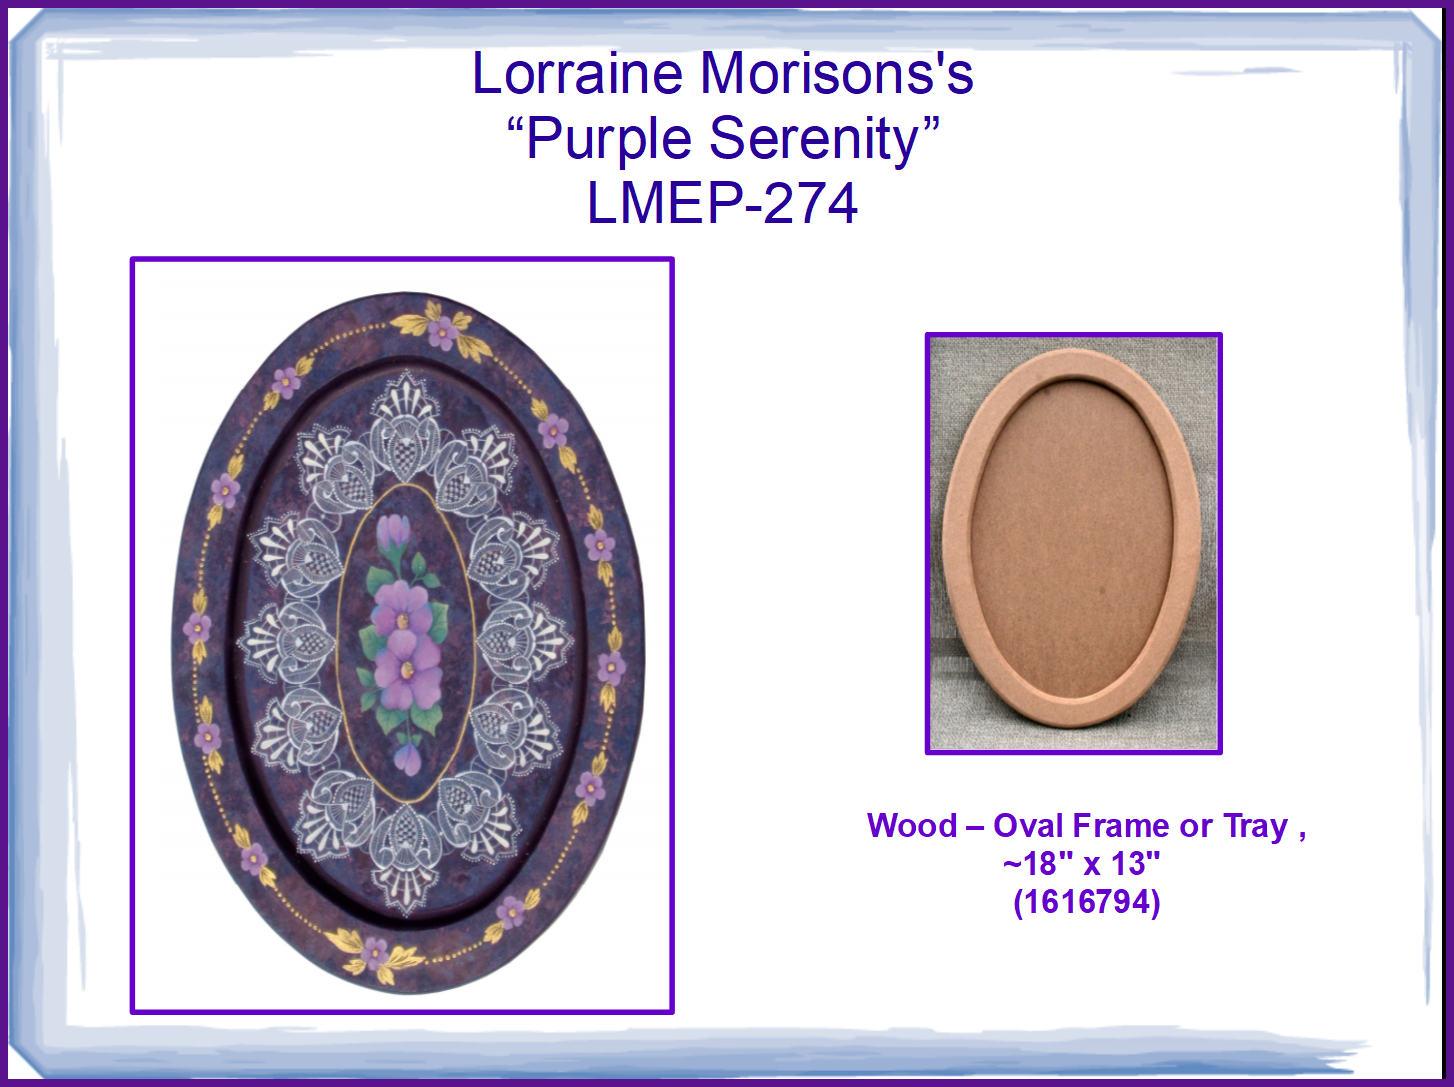 lm-purple-serenity-lmep-274.jpg